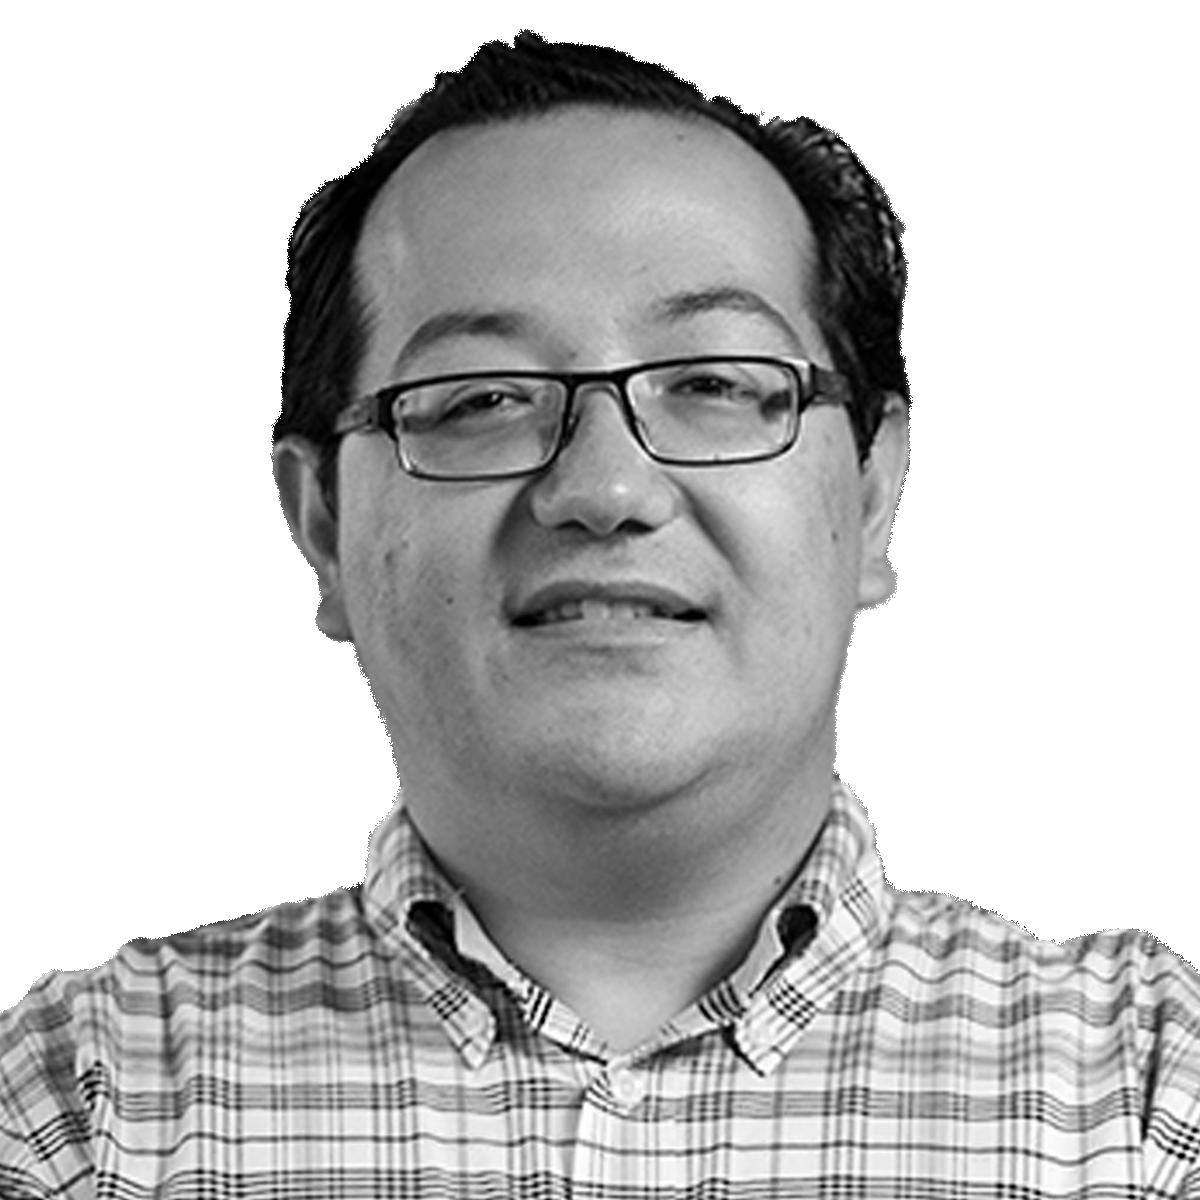 Rafael Campos - CISO